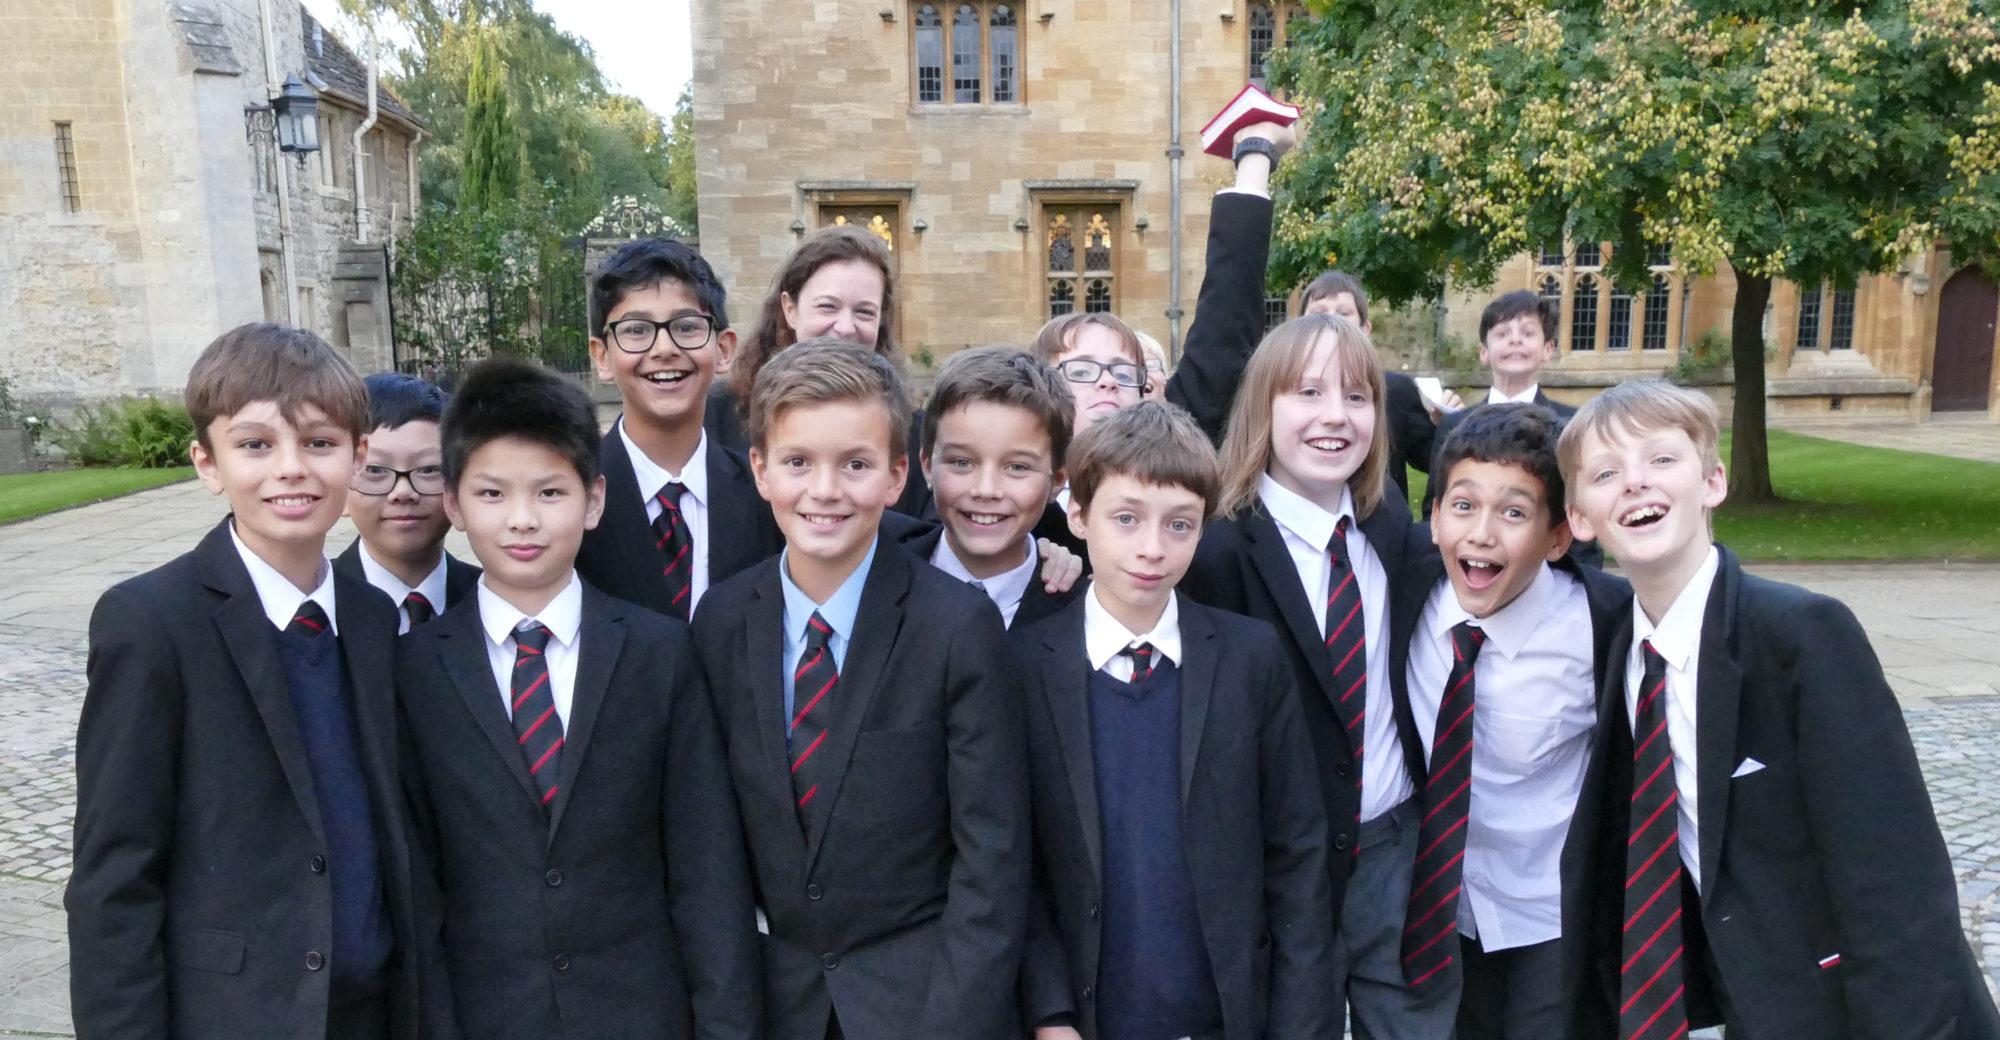 Magdalen College Senior School pupils in uniform